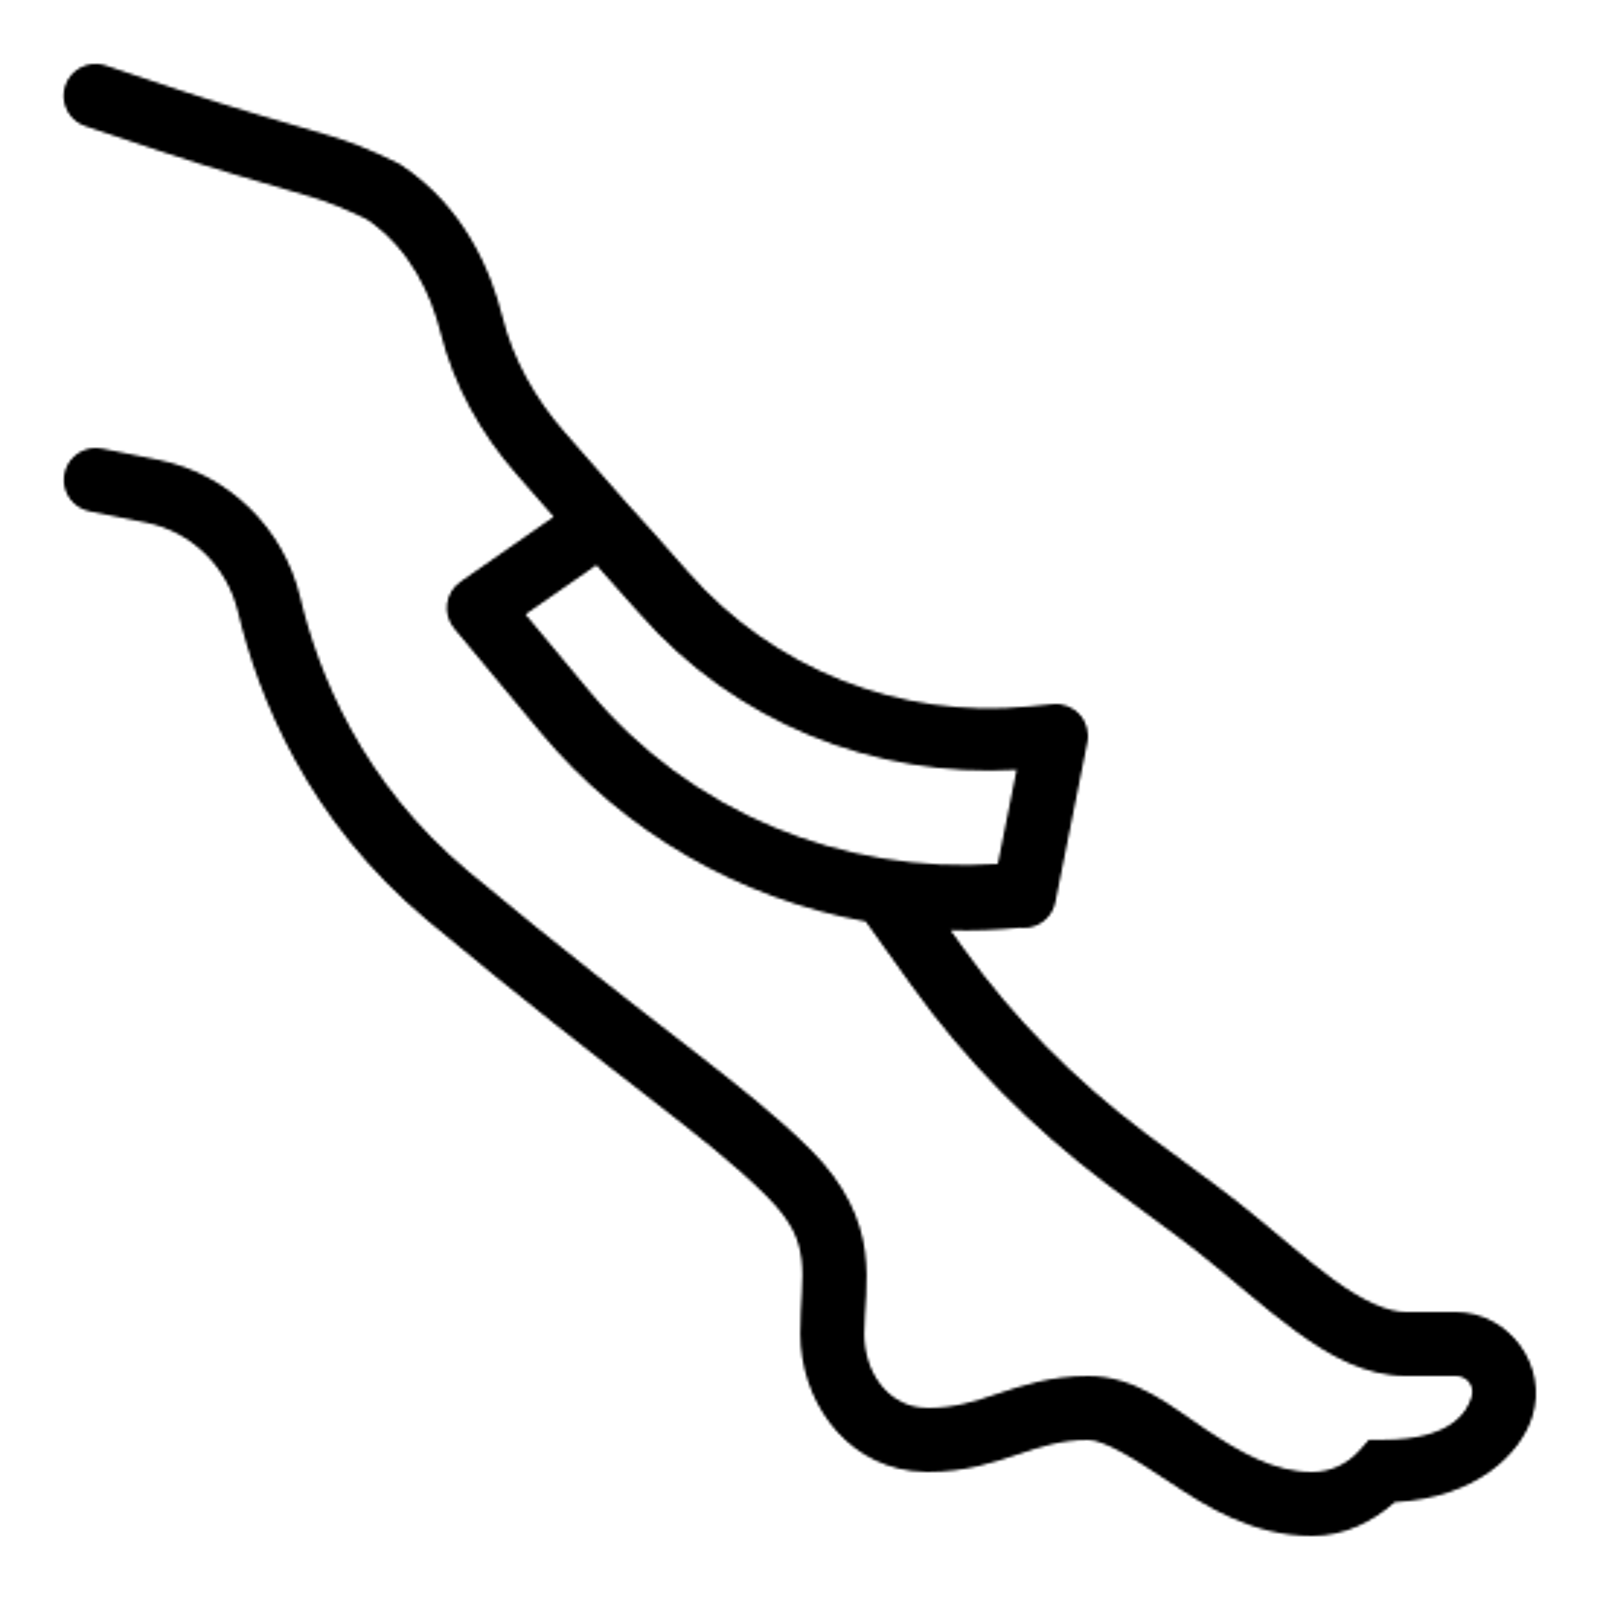 Депиляция icon